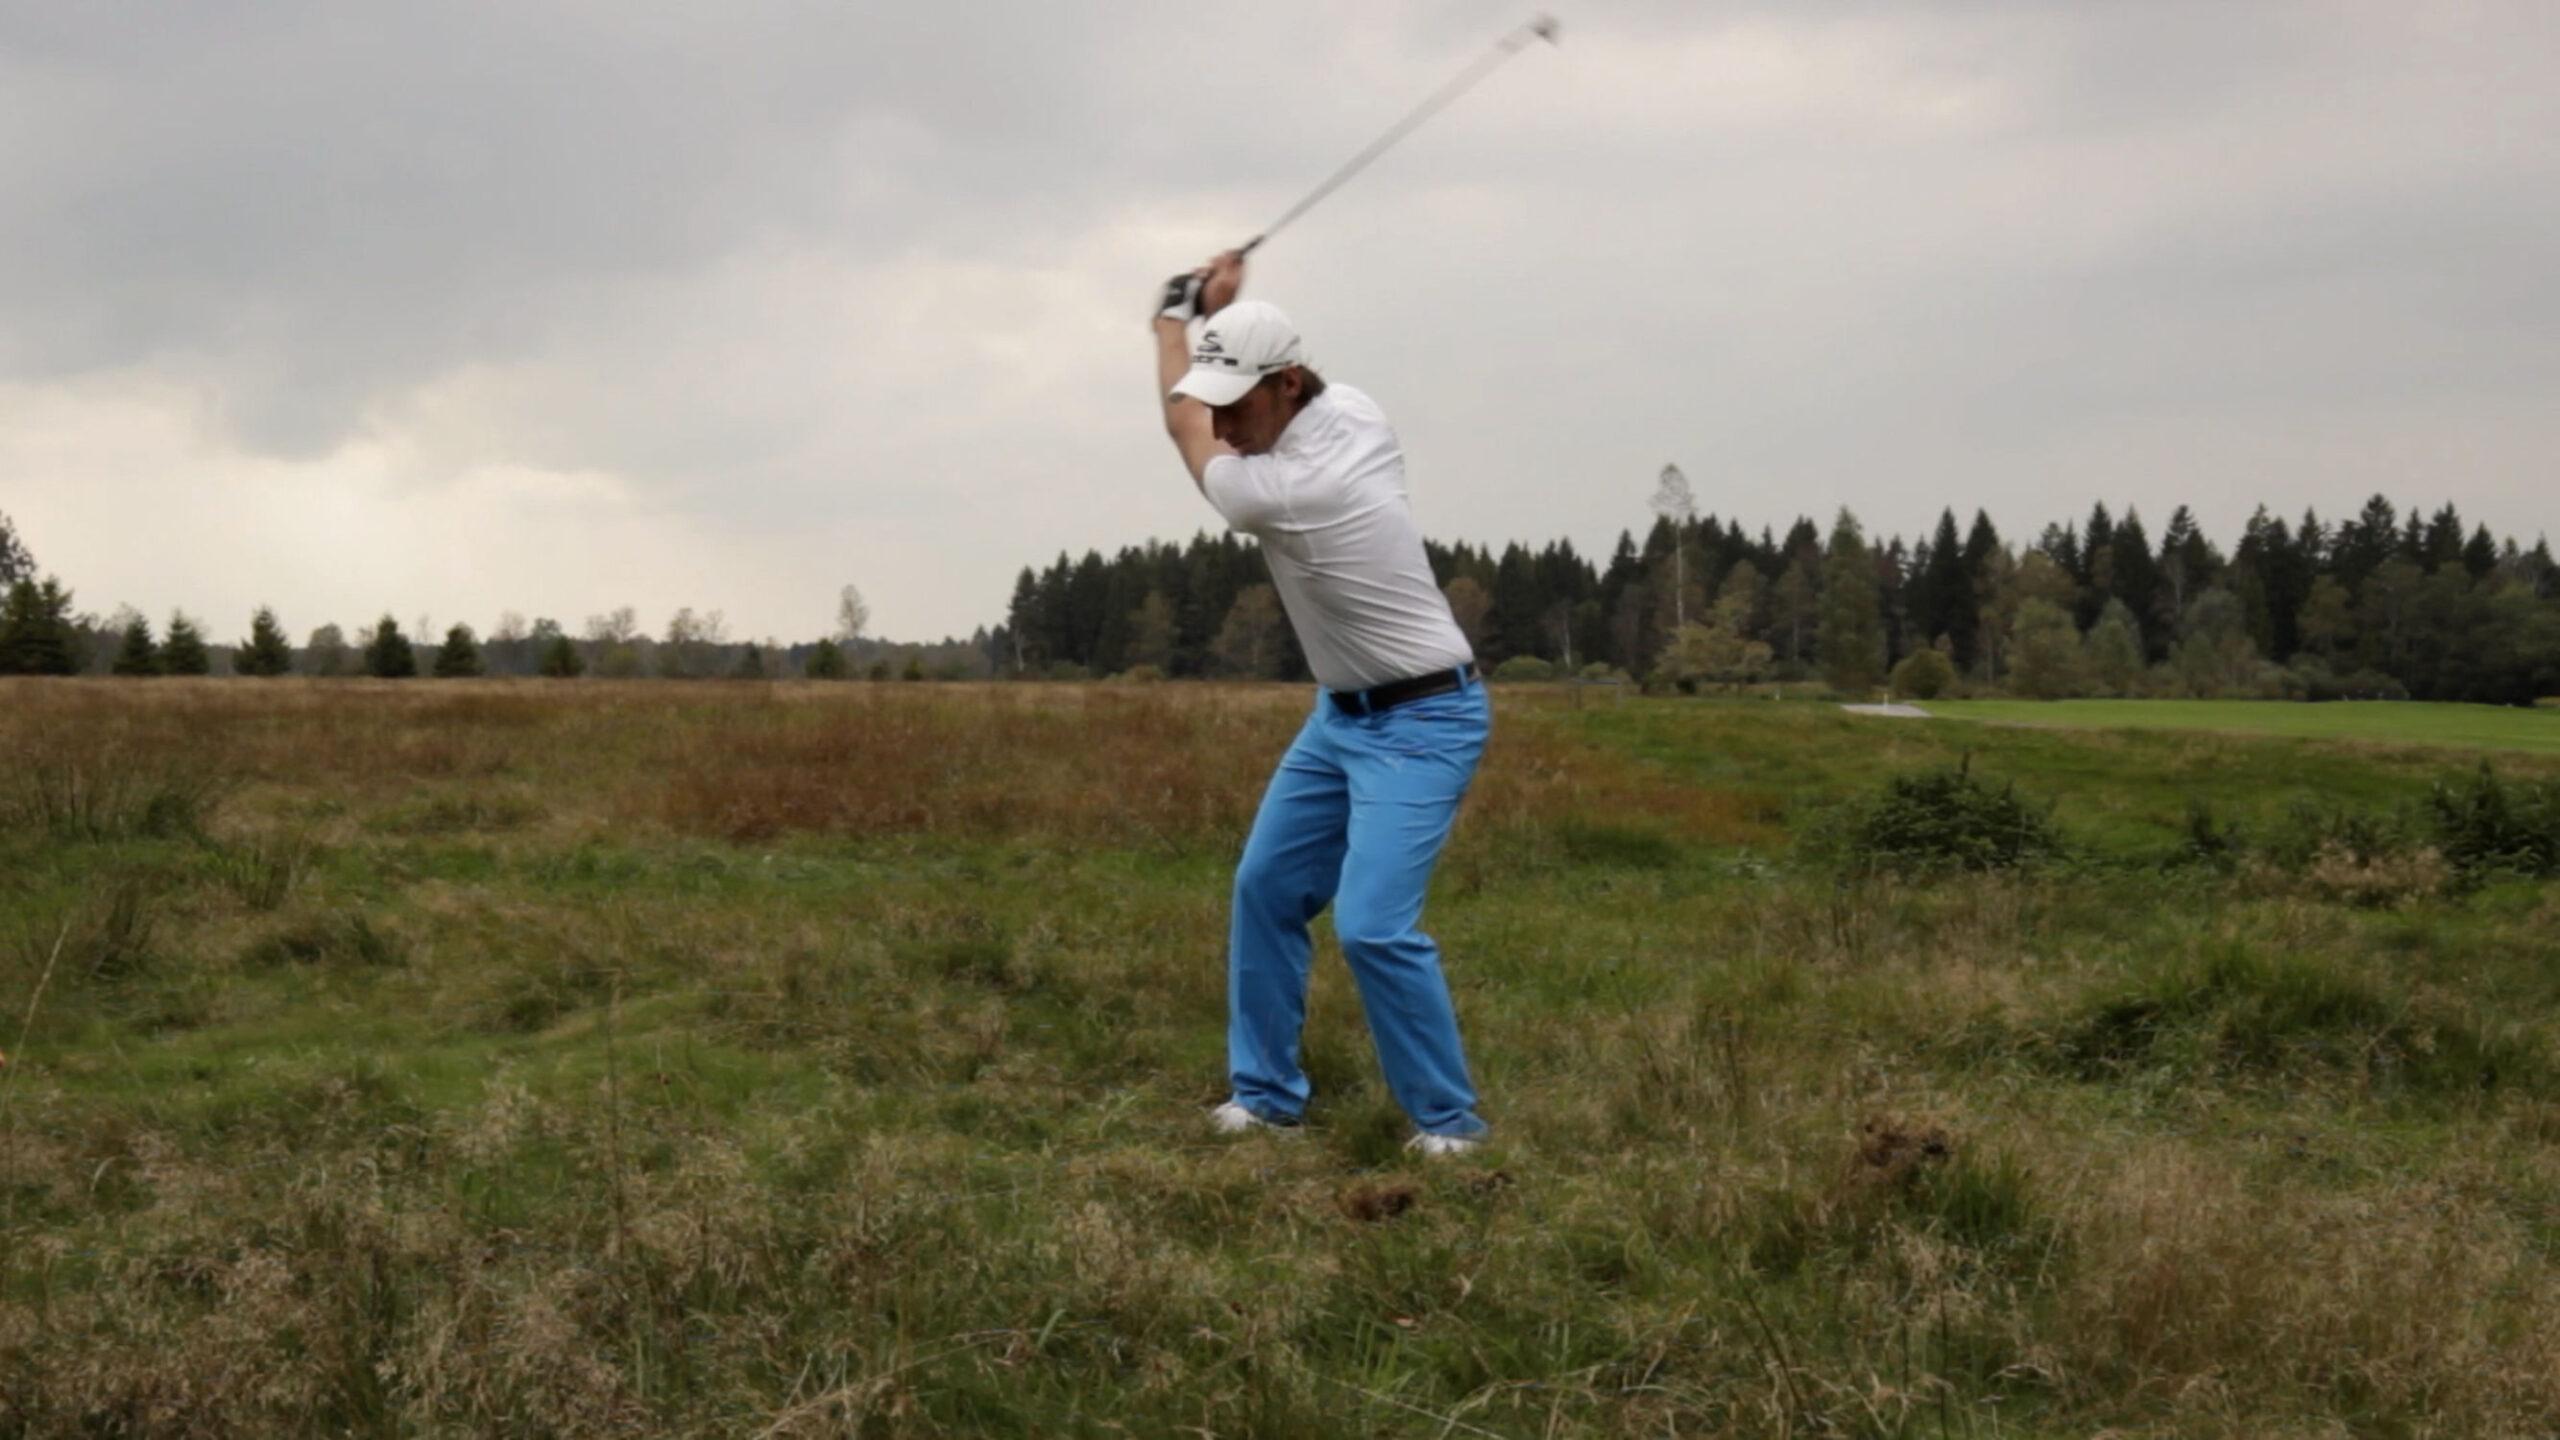 Jugendtraining – Golf – Rough